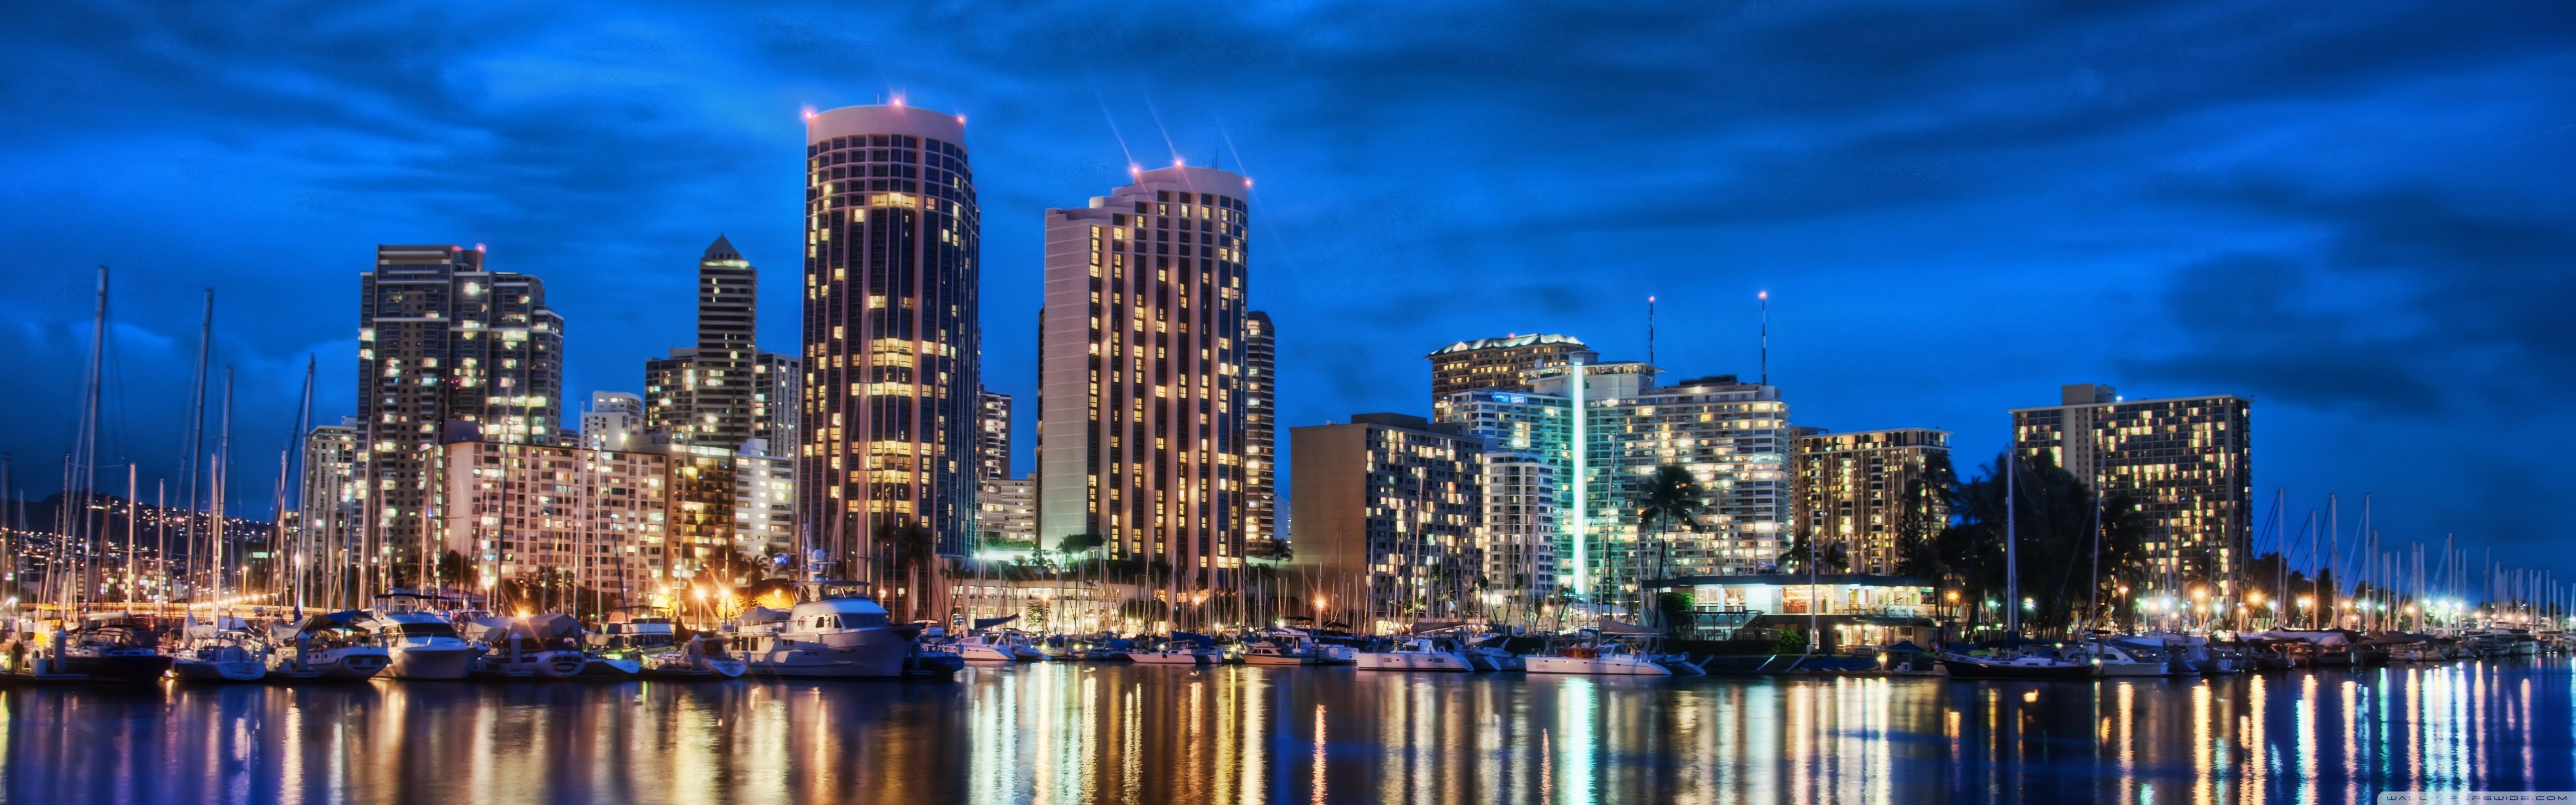 Waikiki Skyline At Night 4K HD Desktop Wallpaper for 4K Ultra 5120x1600